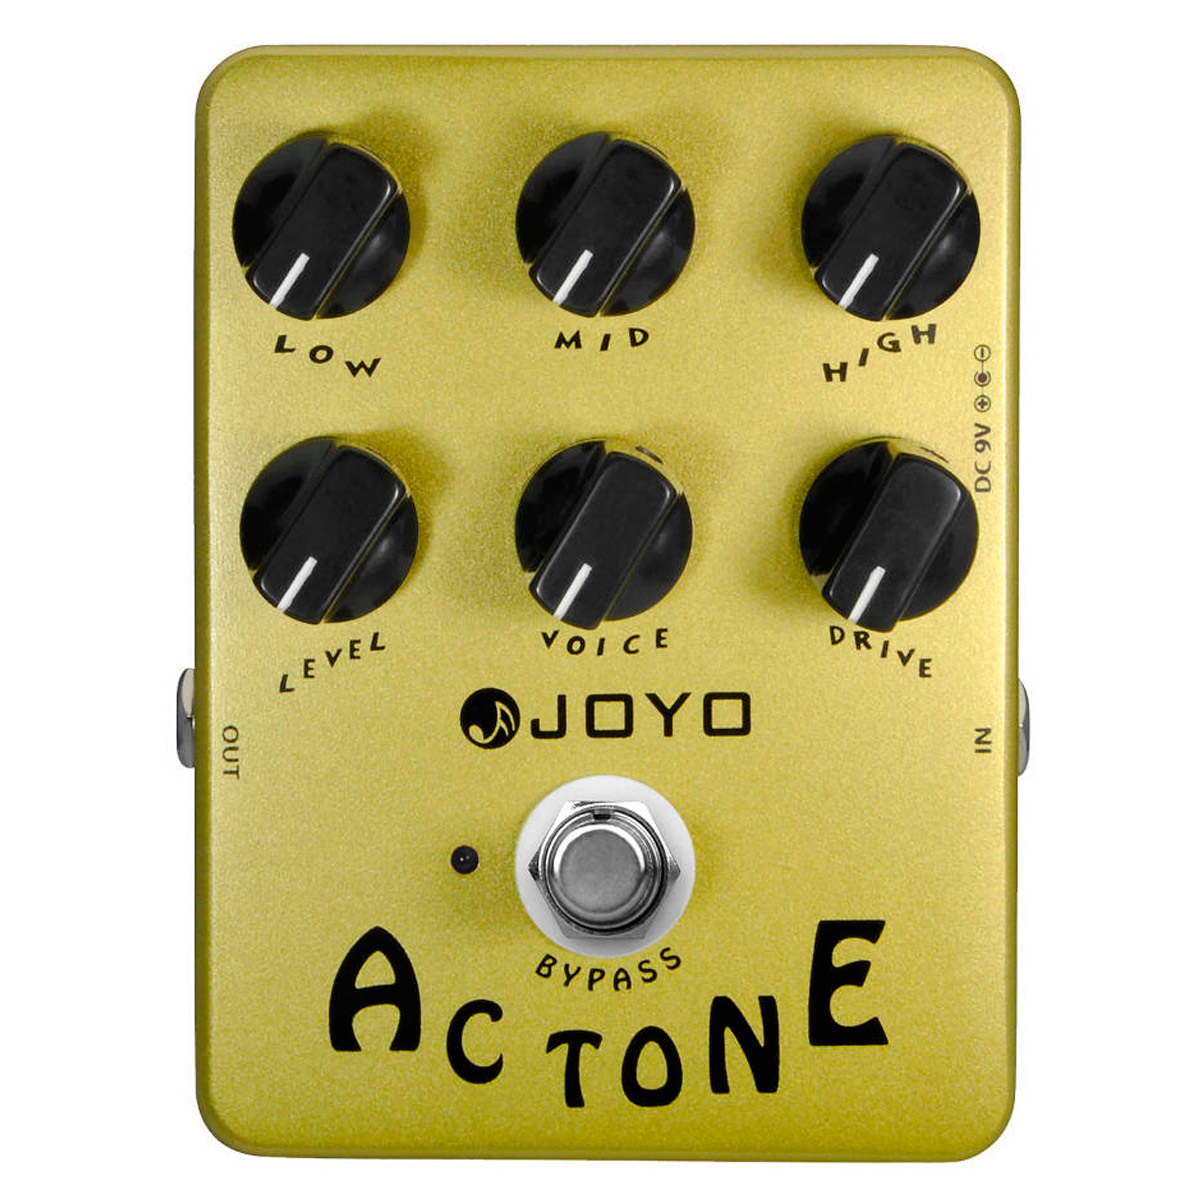 JF13 - Pedal Guitarra AC Tone JF 13 - JOYO